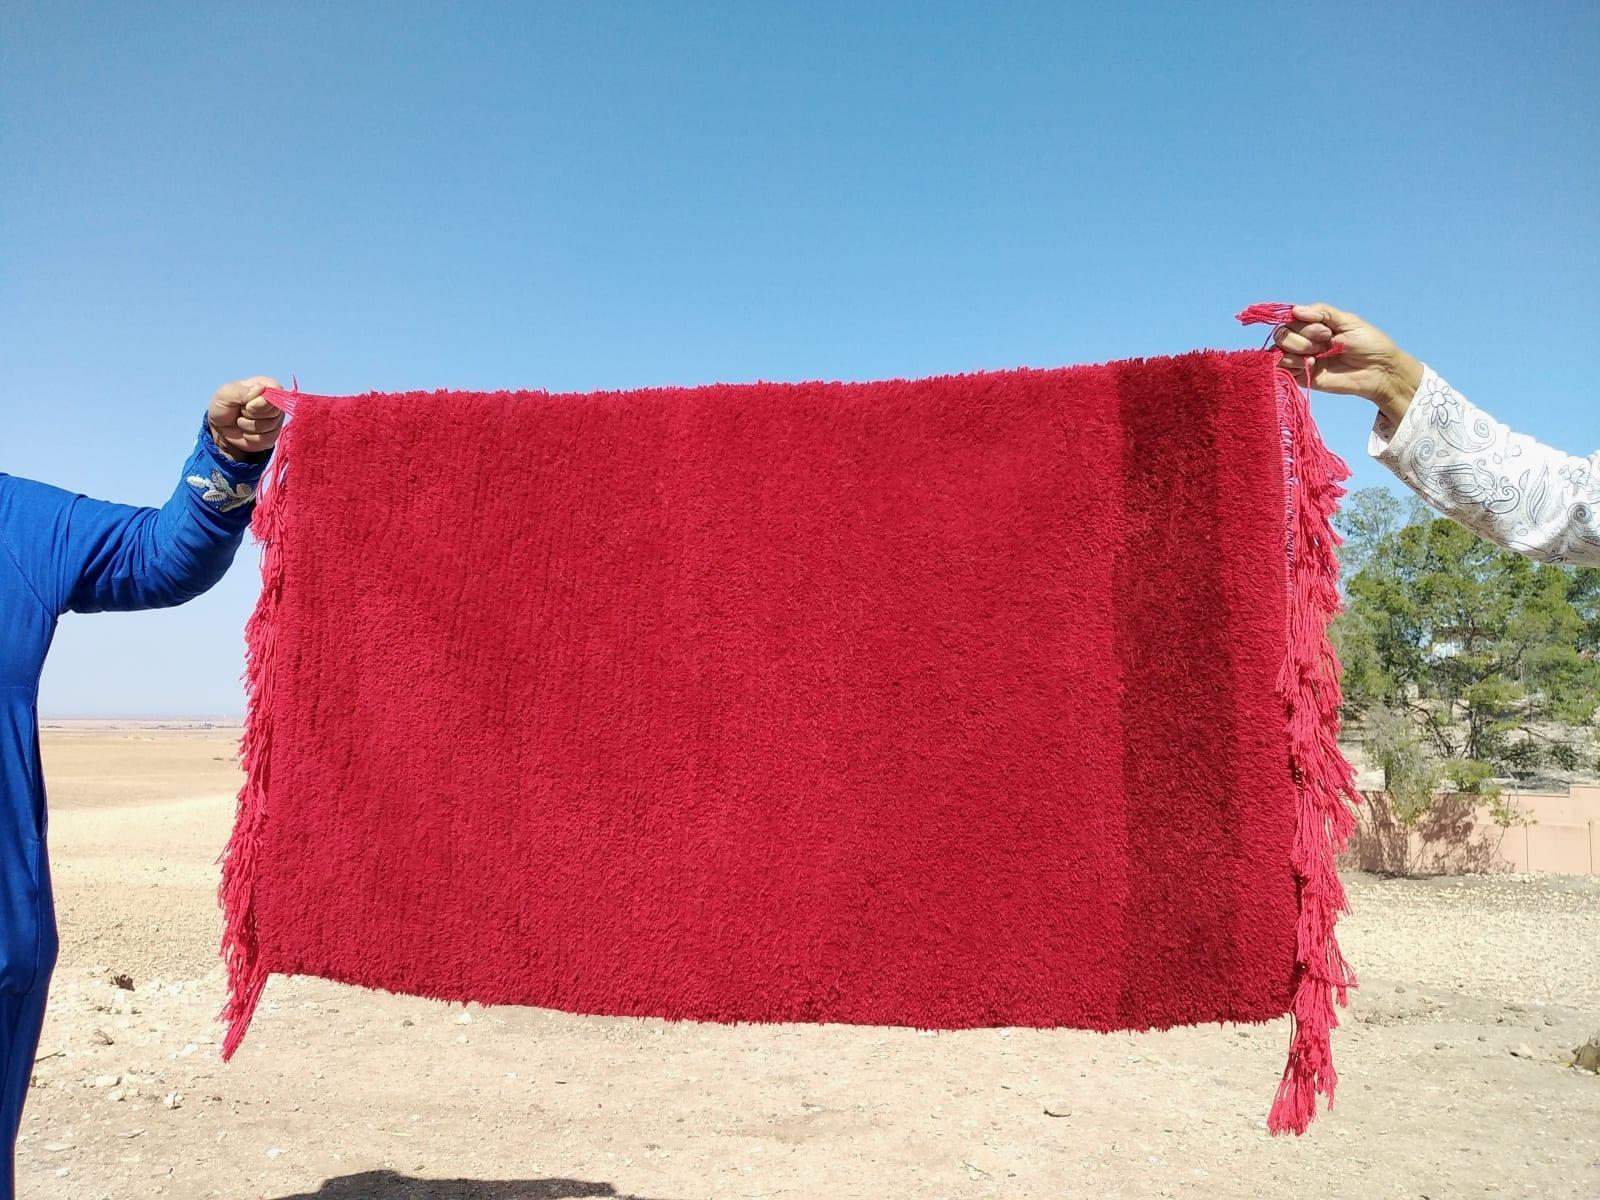 Handmade carpet  Sedda  and Wool Red Morocco